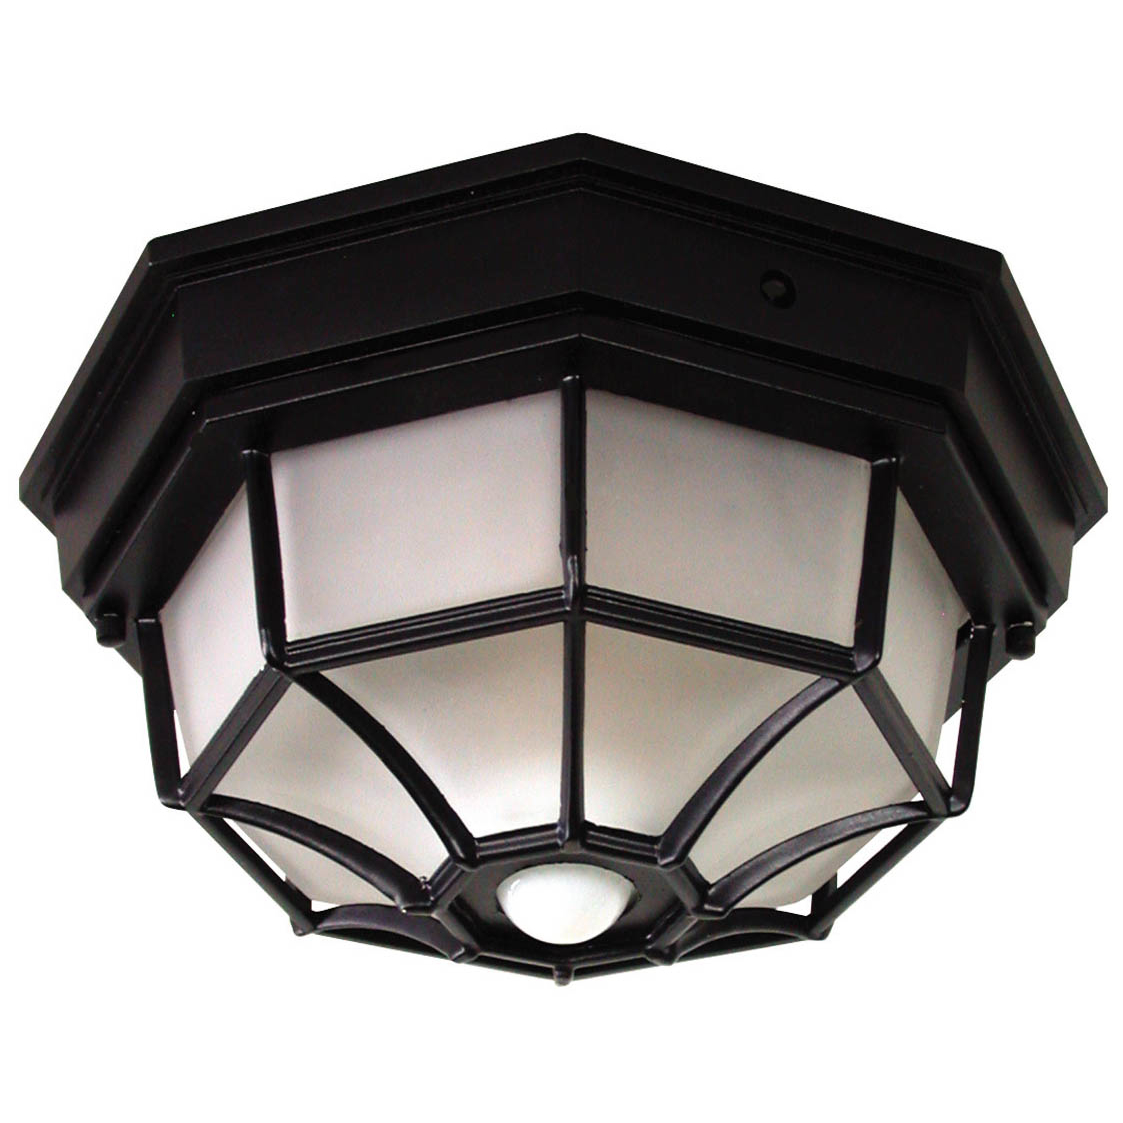 Heathco HZ-4300-BK 4 Bulb 25 W Black Candelabra DualBrite® Ceiling Lite